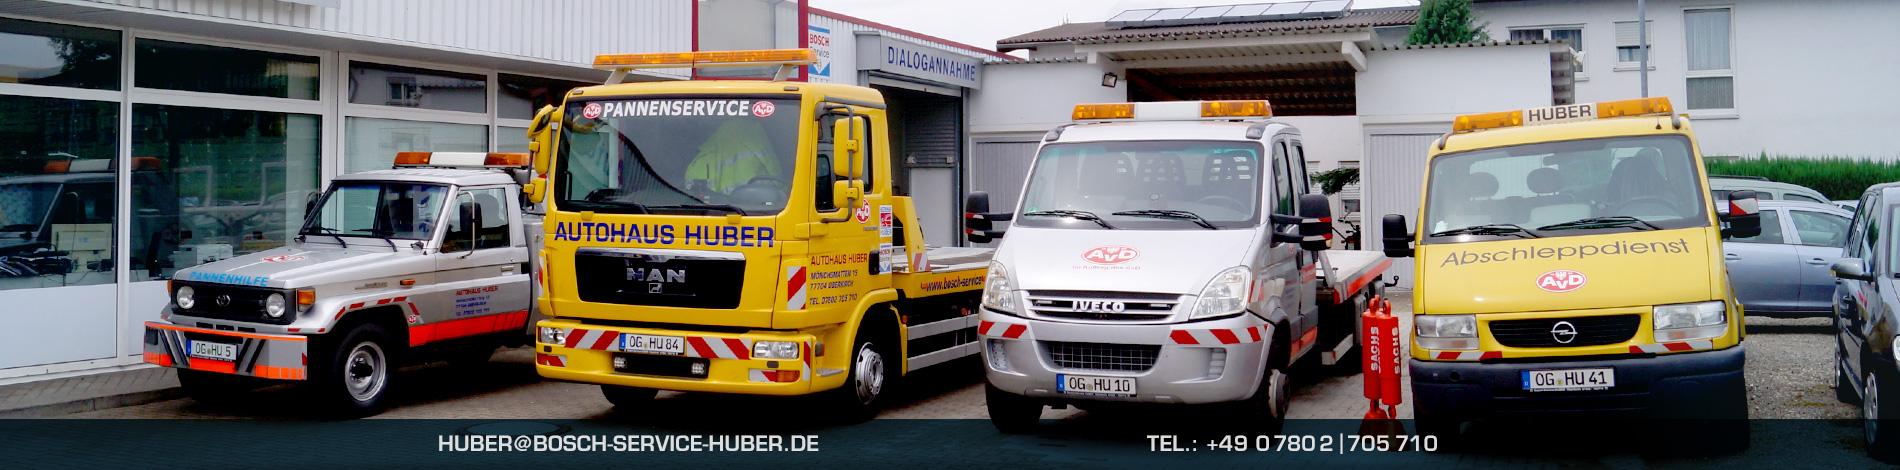 Unsere Abschleppflotte – Bosch Car Service Oberkirch, Autohaus Huber